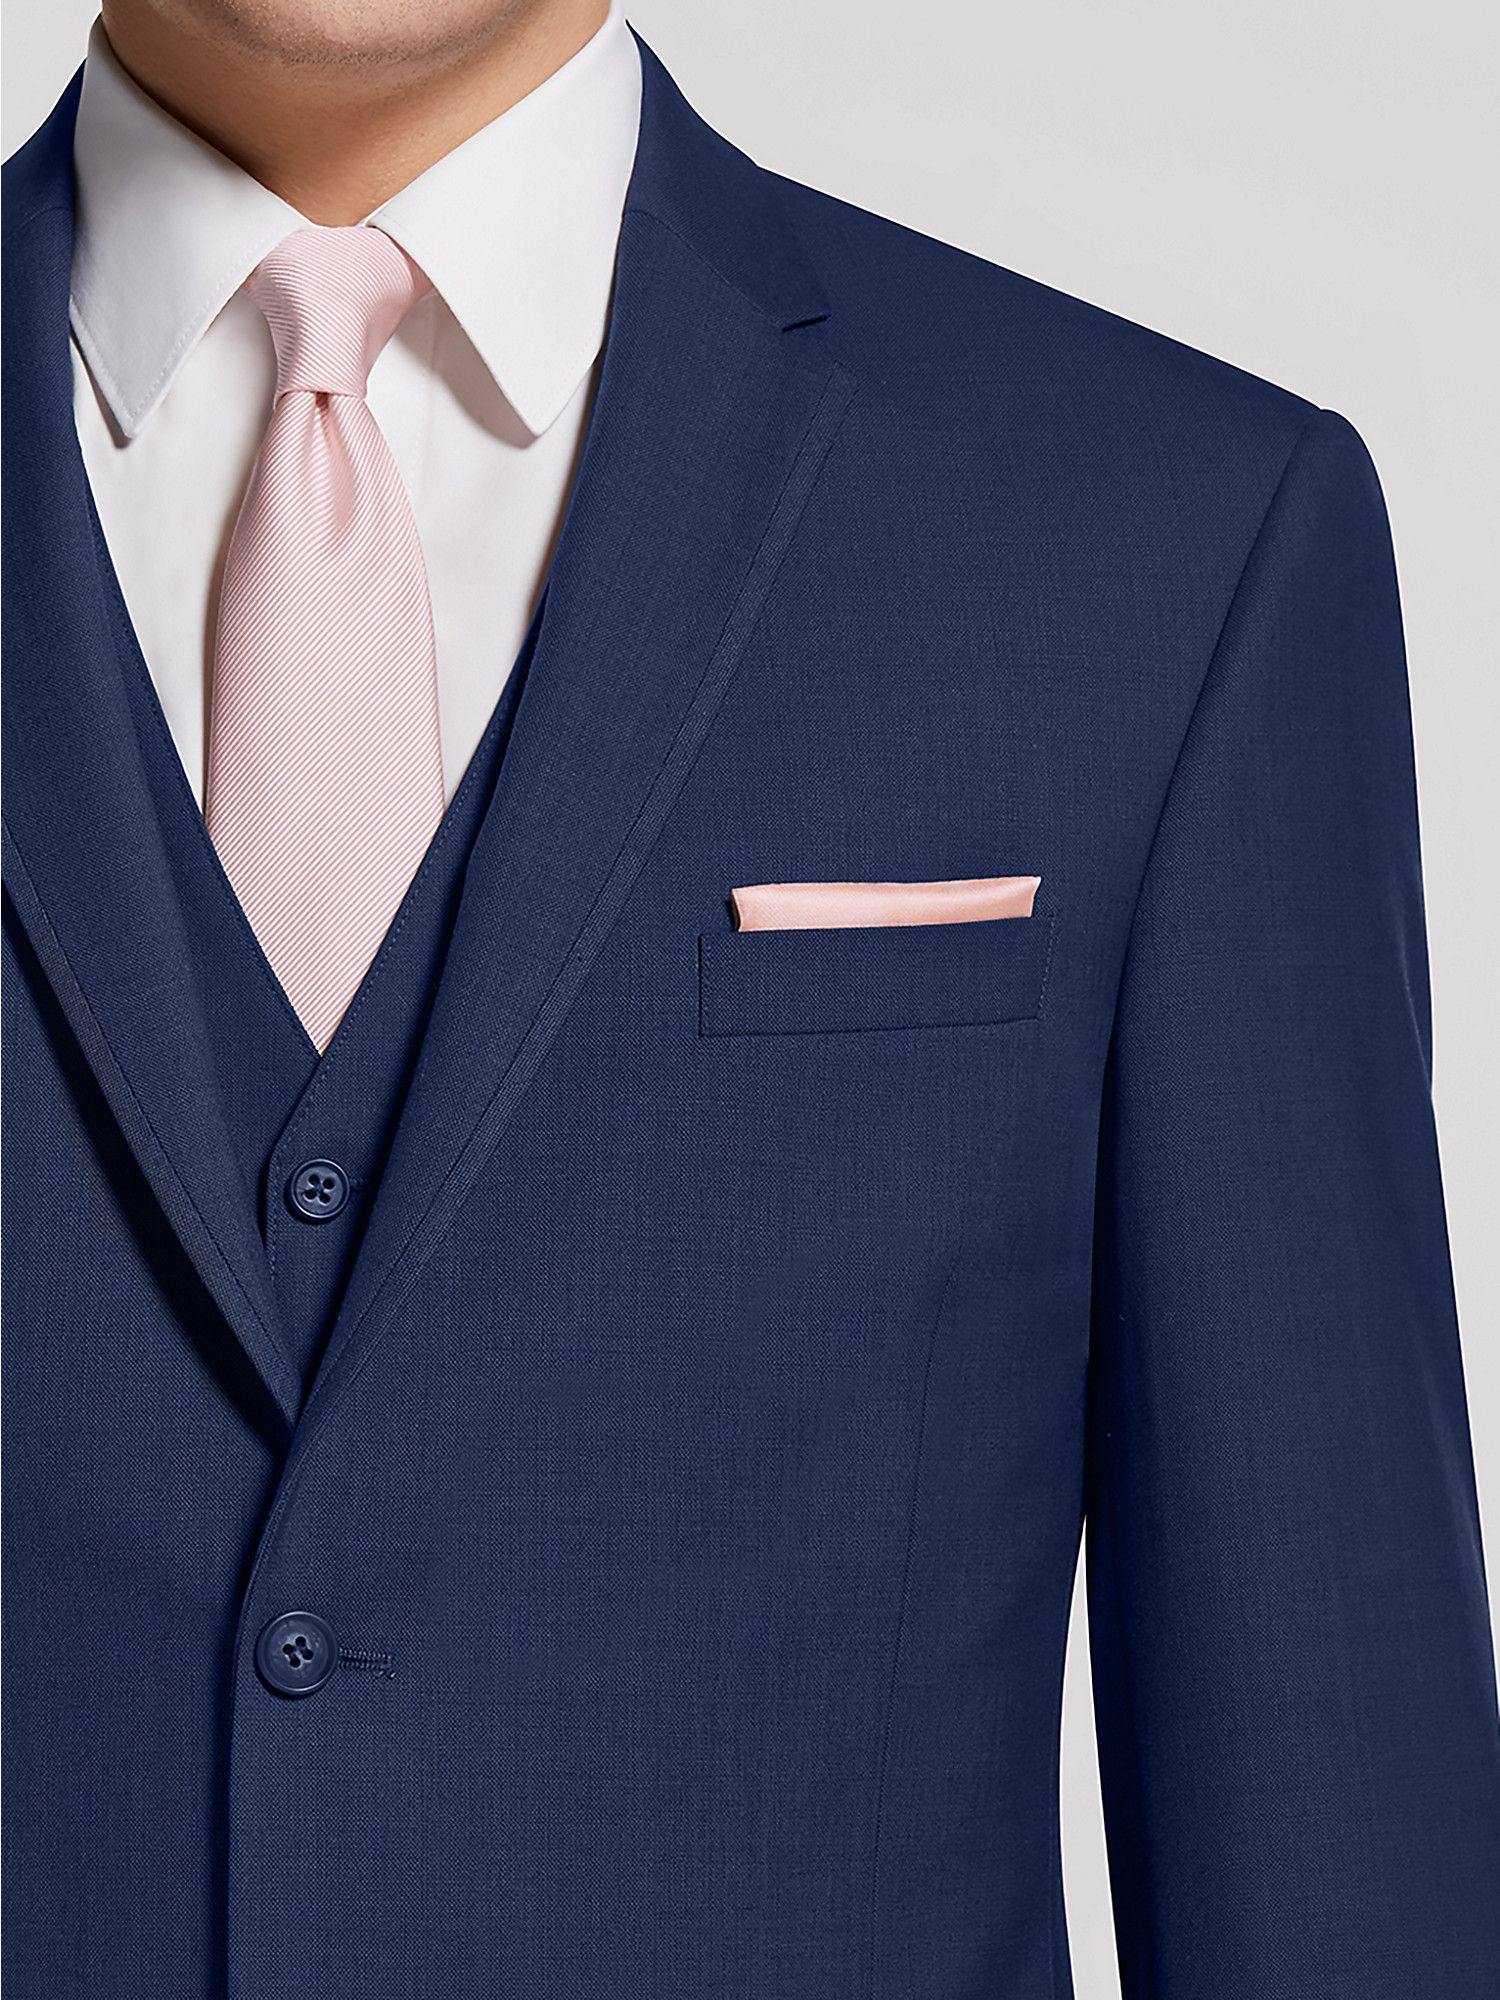 Wedding Tuxedo Rental Blue Wedding Wedding Suits Men Blue Wedding Men